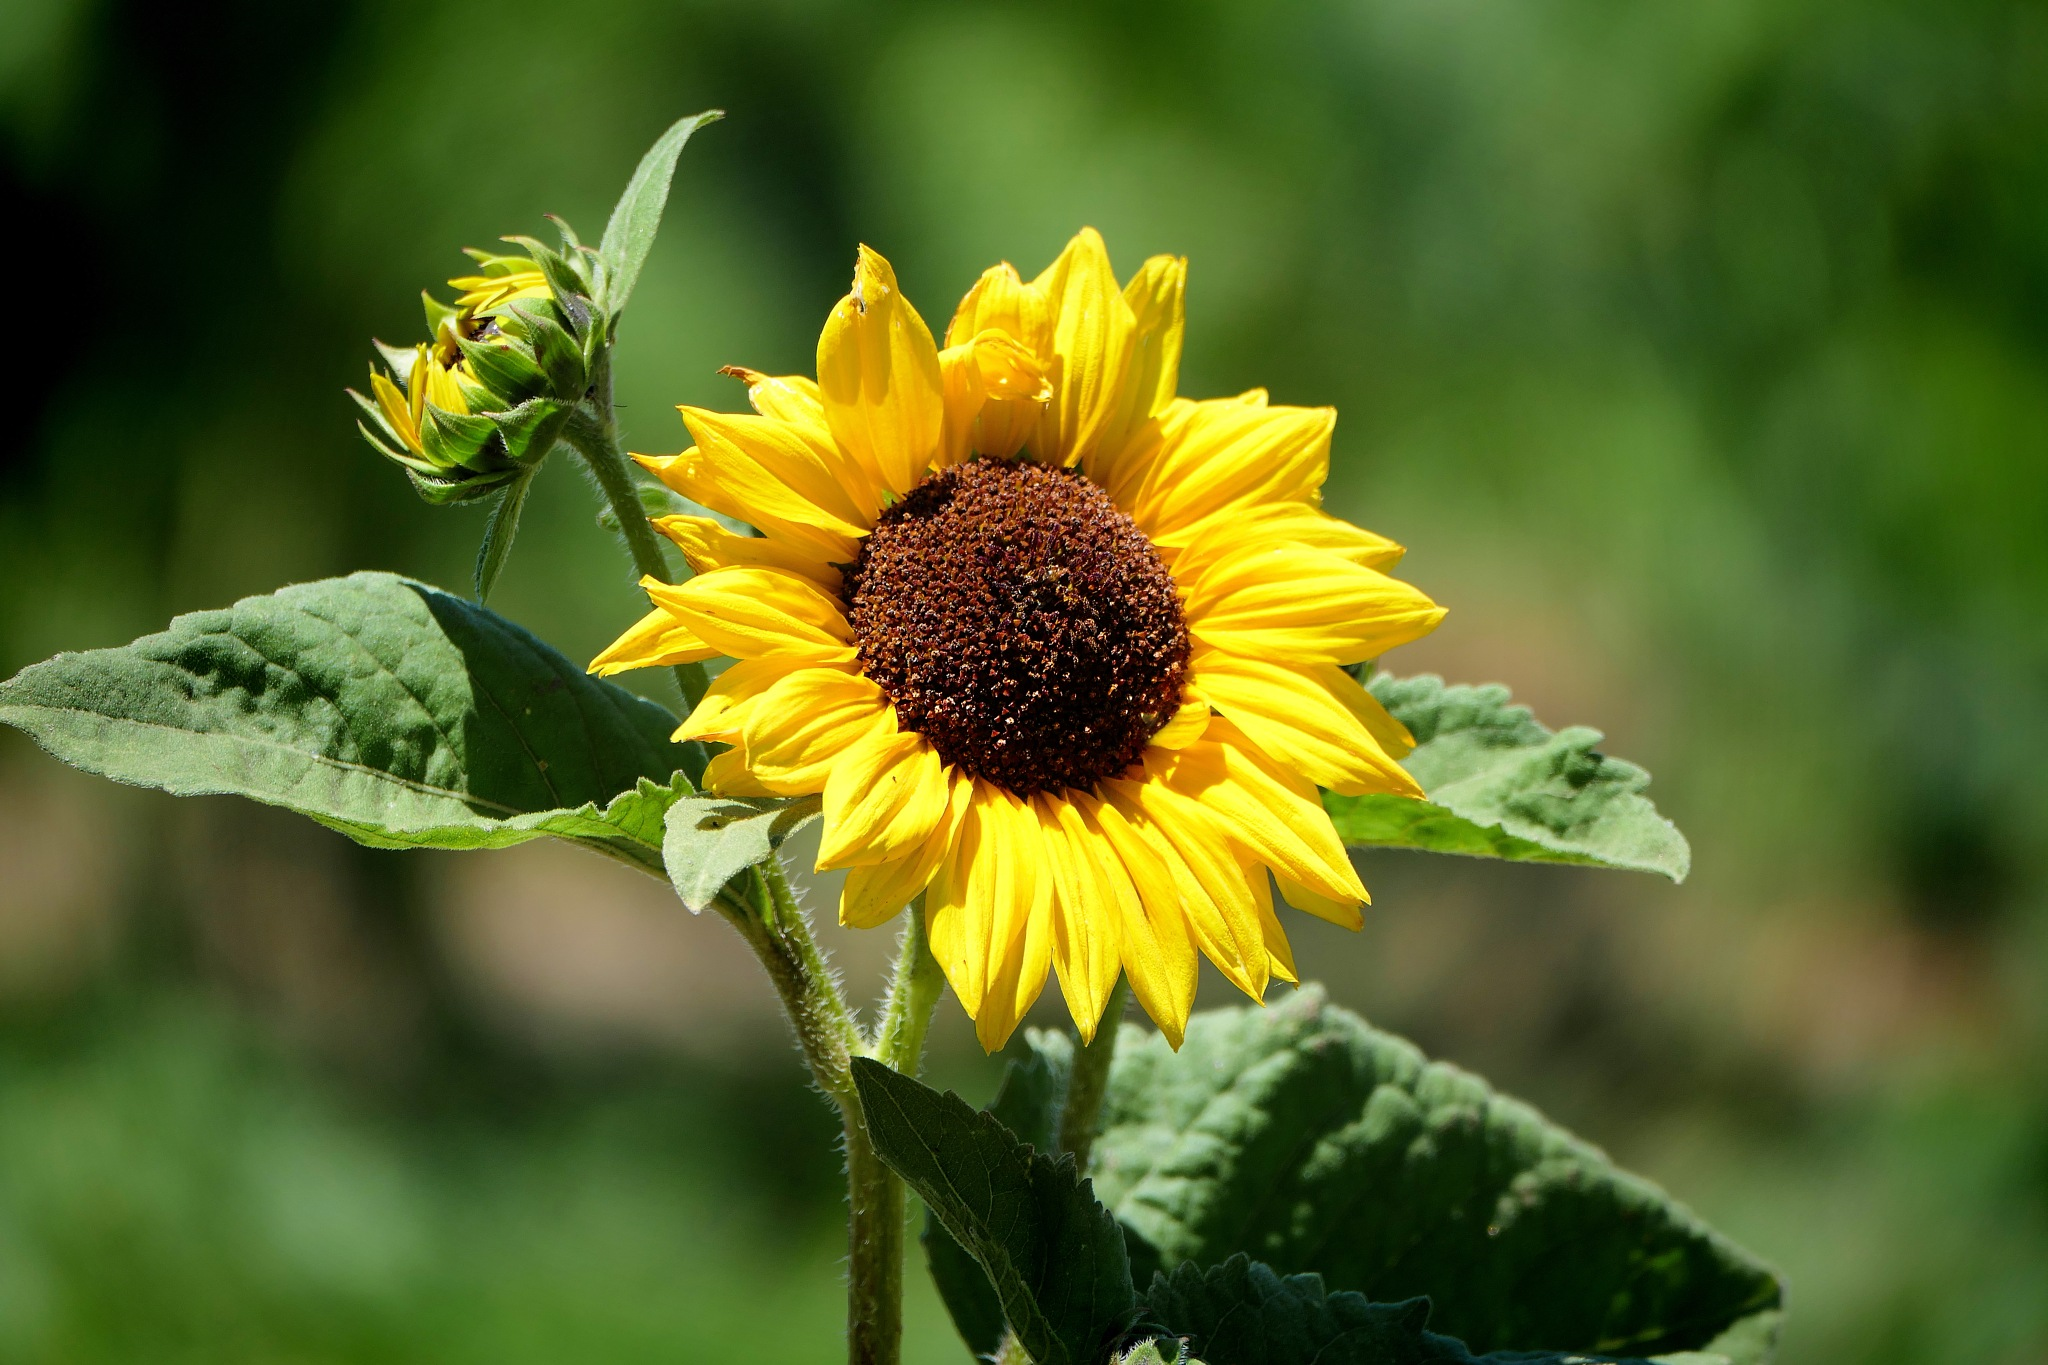 Sunflower by Thinduck